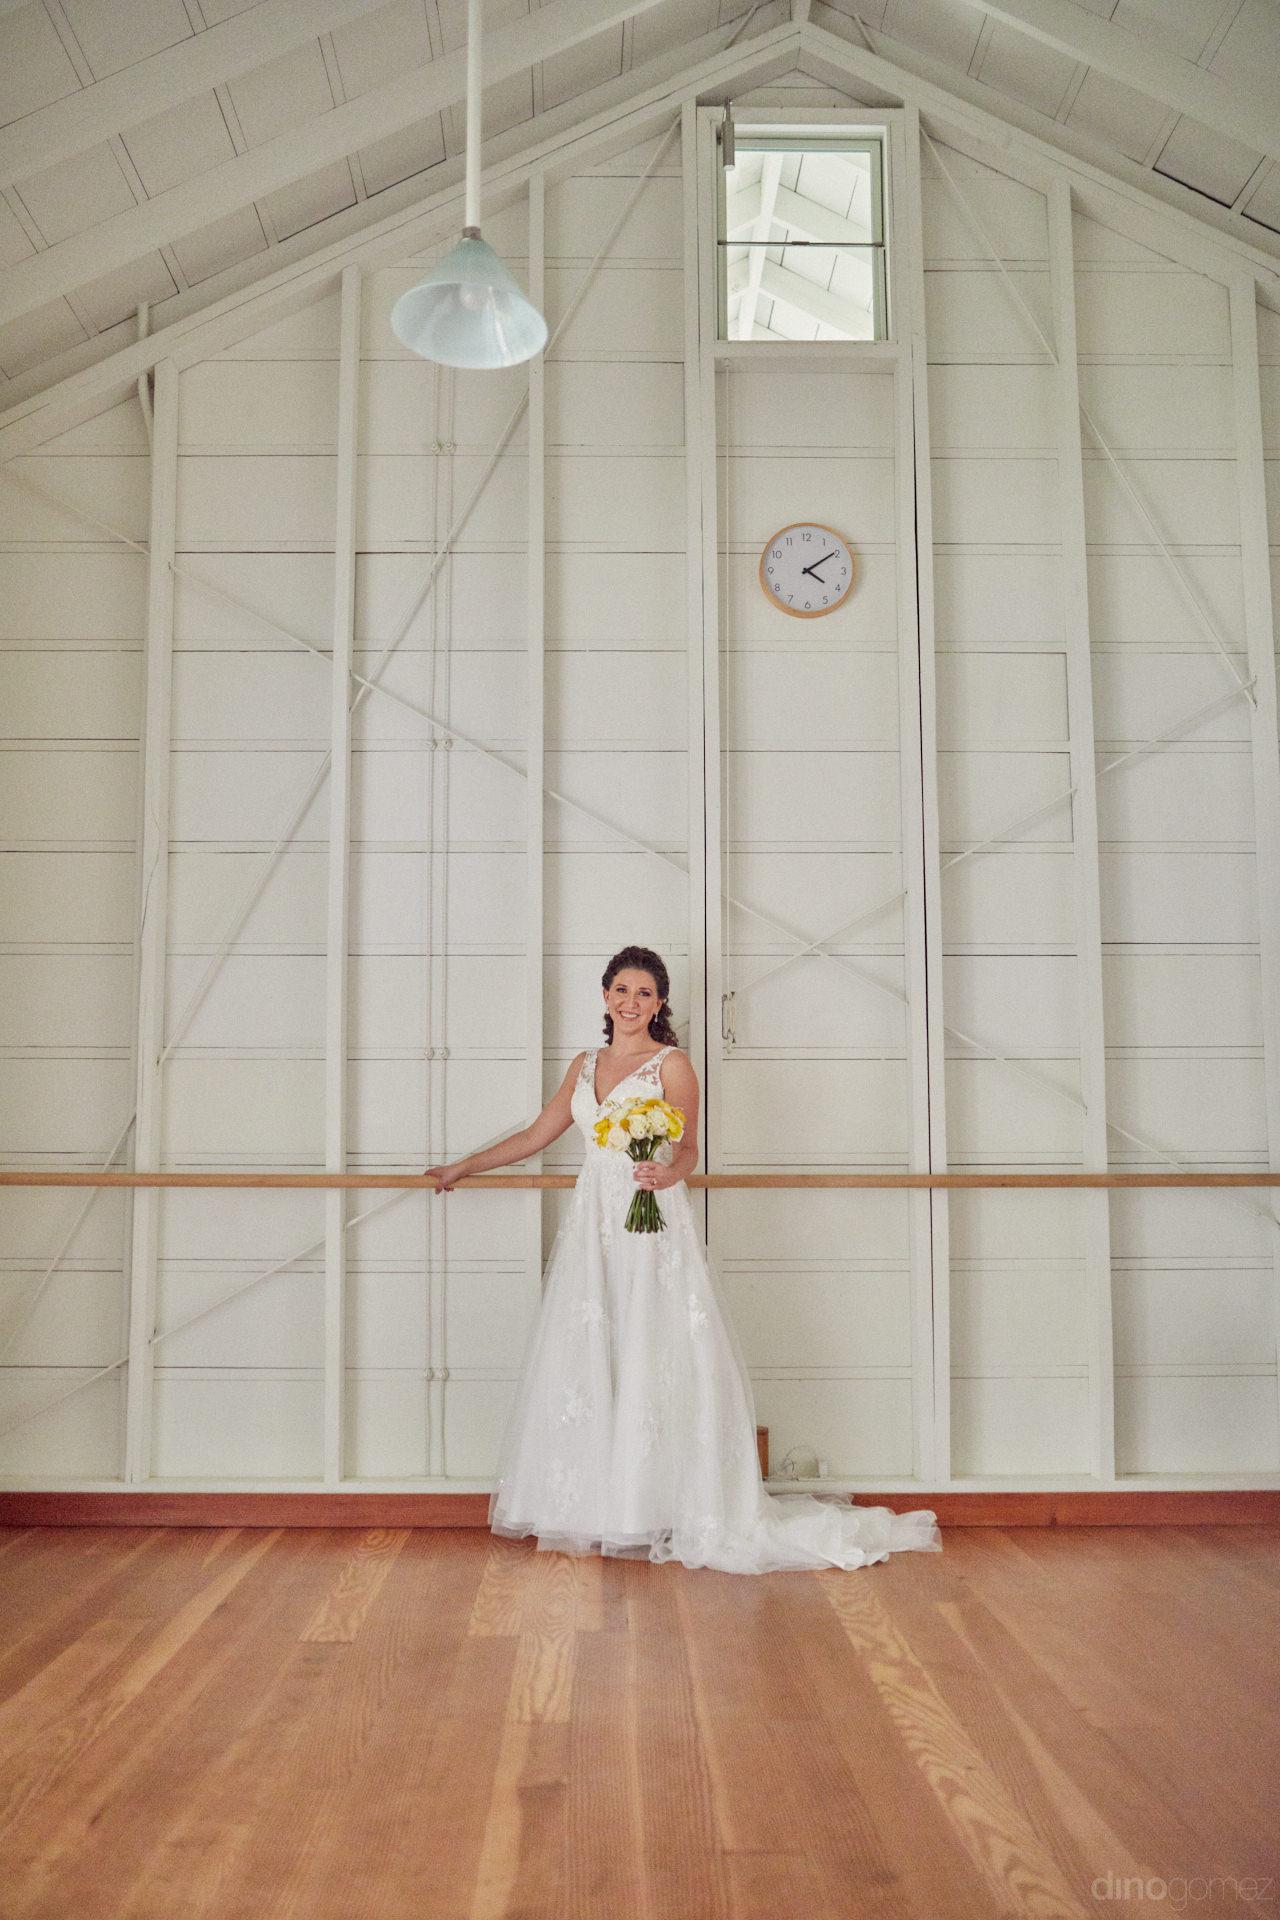 Minimalist Destination Wedding Photos In Mexico - Hilary & Bryan Flora Wedding